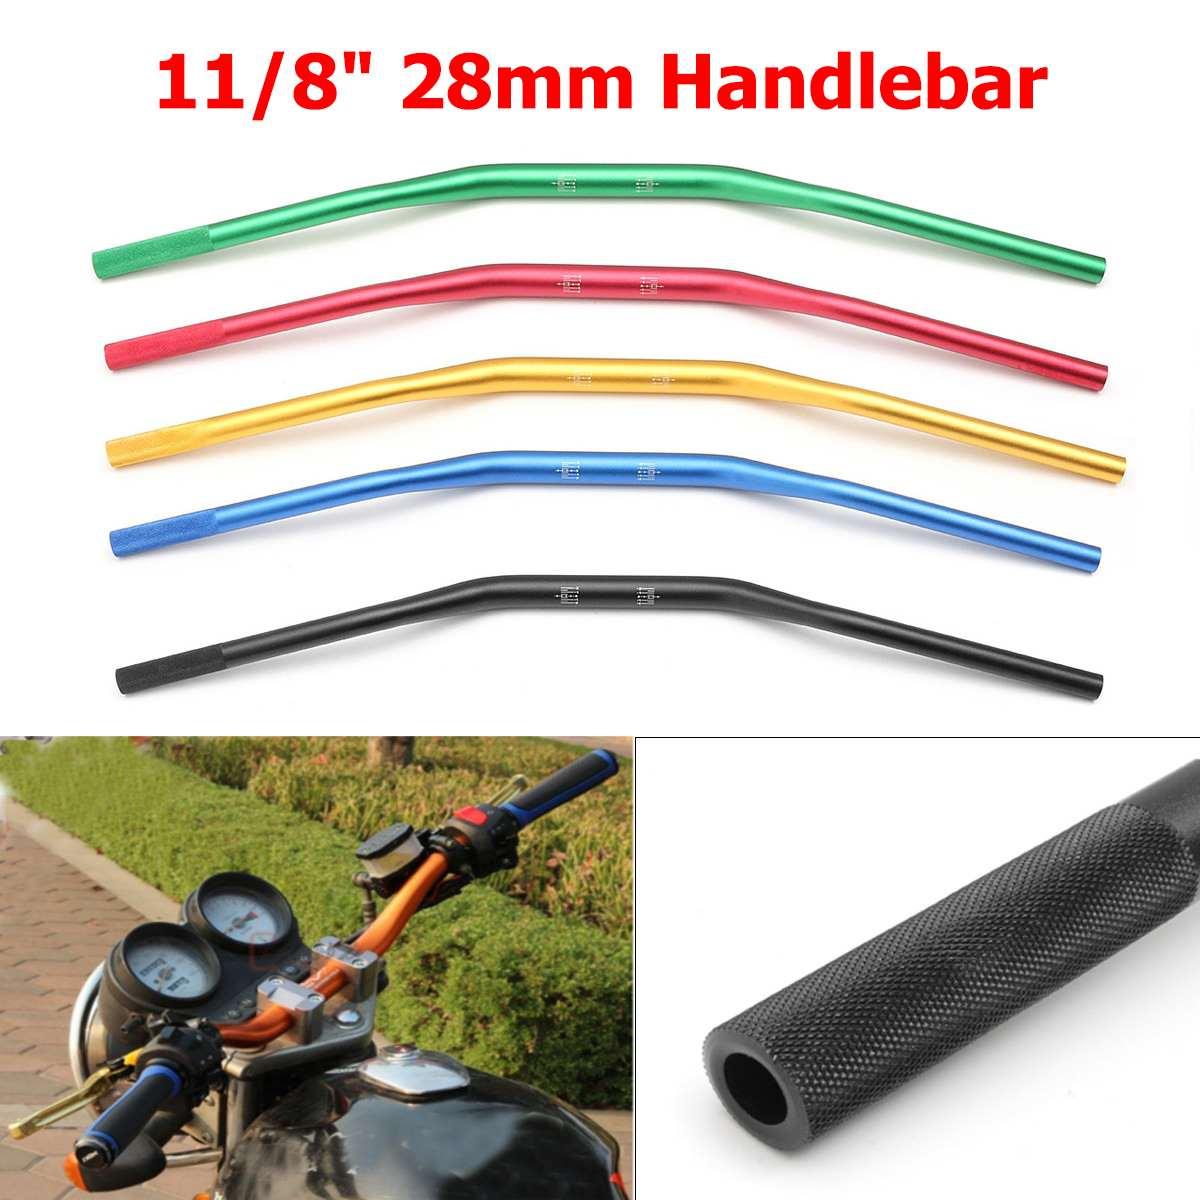 28mm 1 1 8inch Motorcycle Handlebar Handle Bar Universal For Scooter Dirt Pit Bike Quad ATV